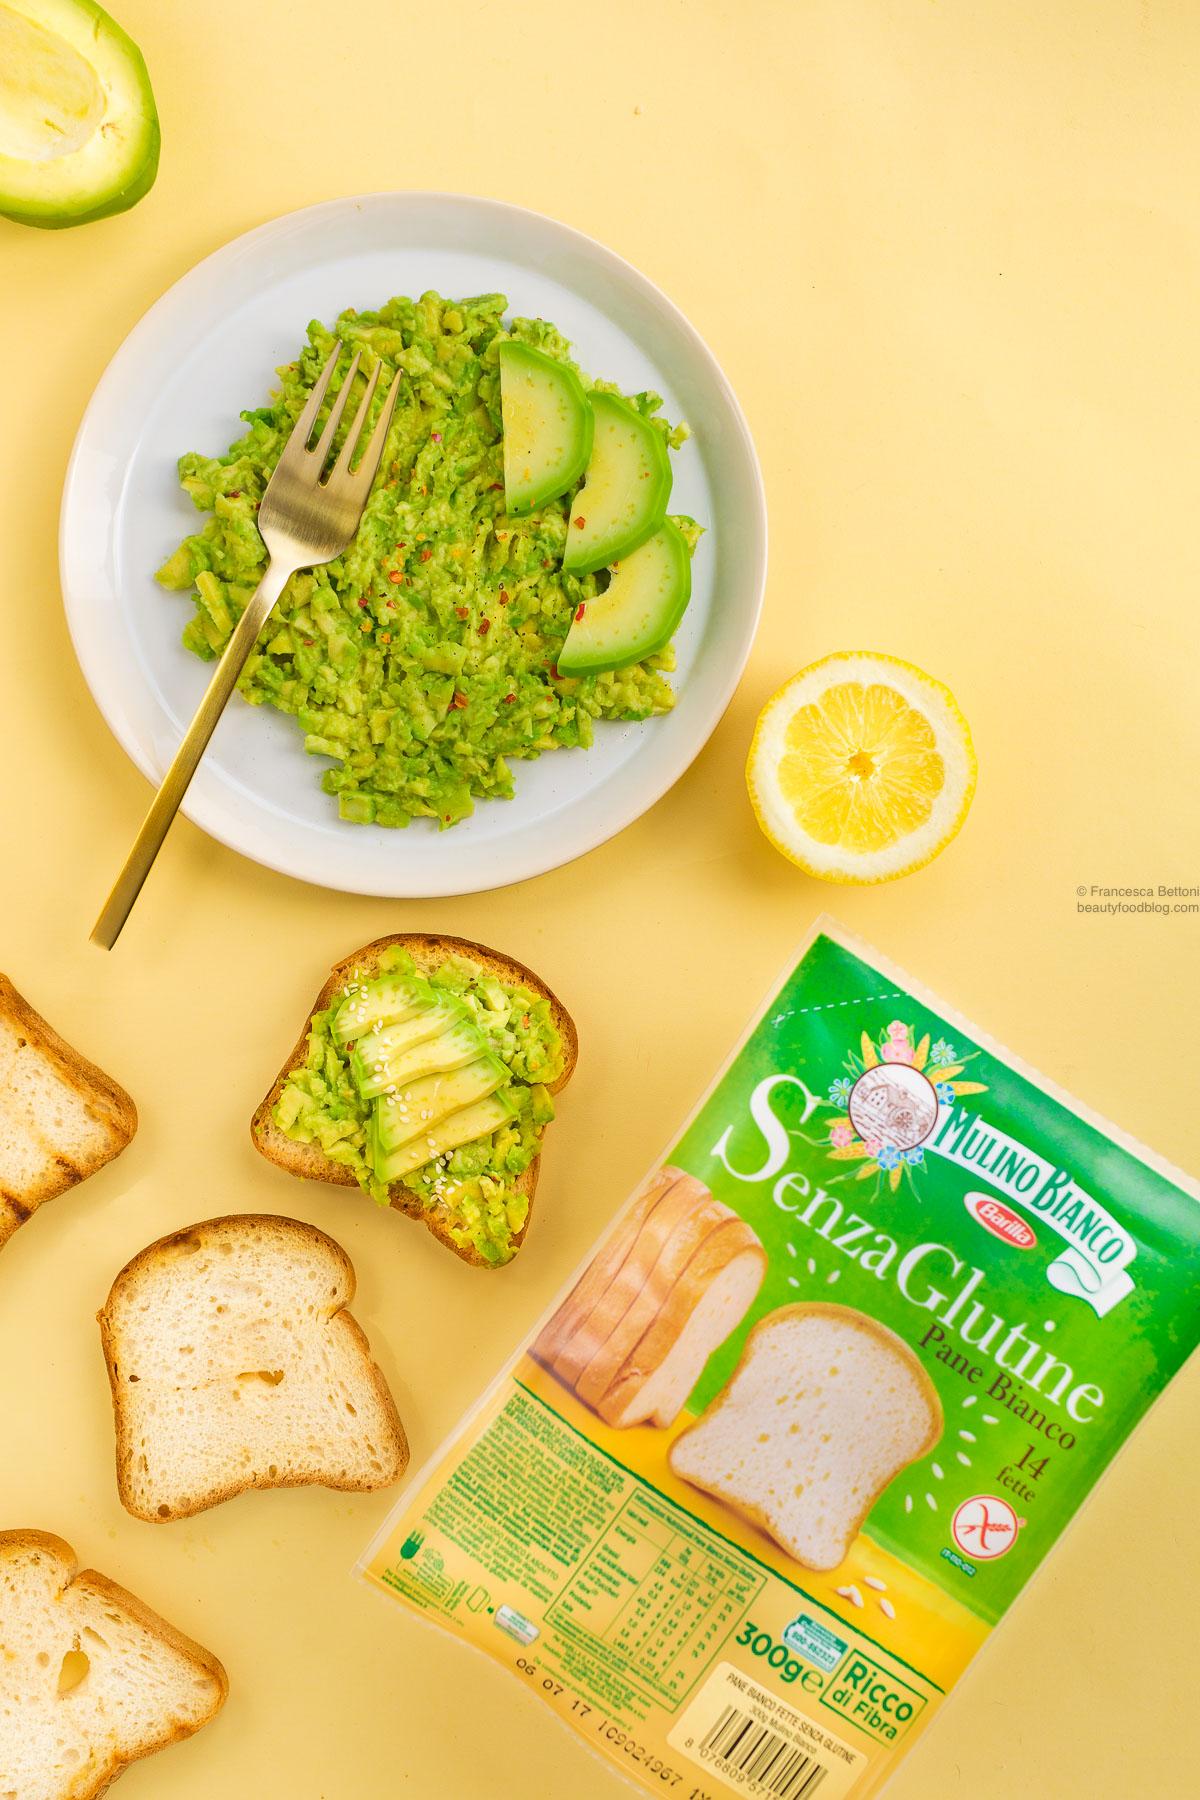 ricetta avocado toast vegan senza glutine - vegan avocado toast recipe